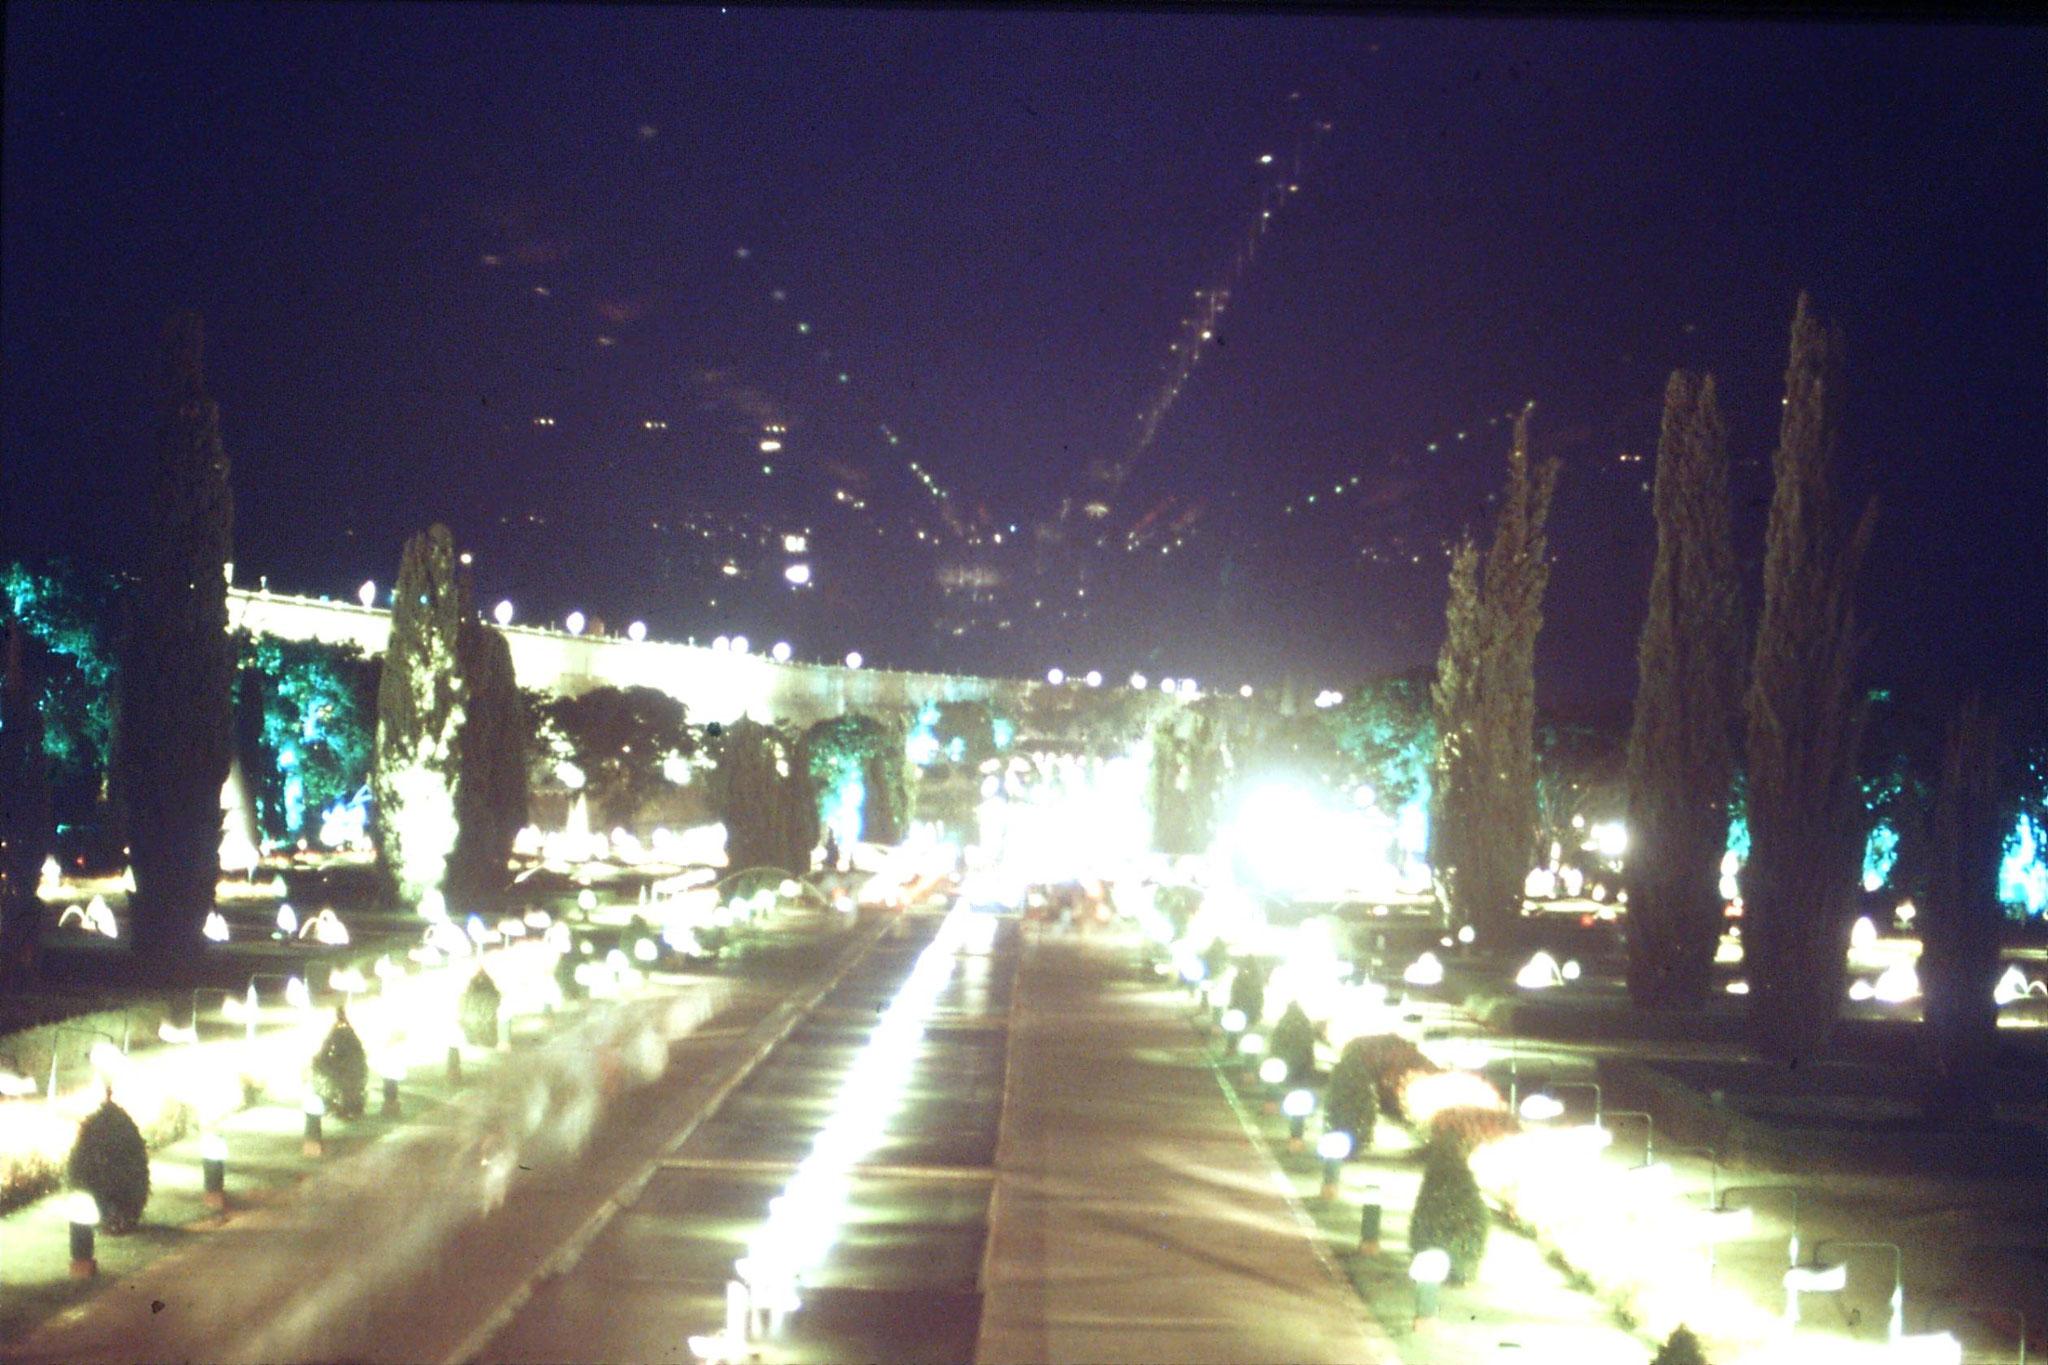 108/9: 12/3/1990 Brindavan Garden at night (15 secs)